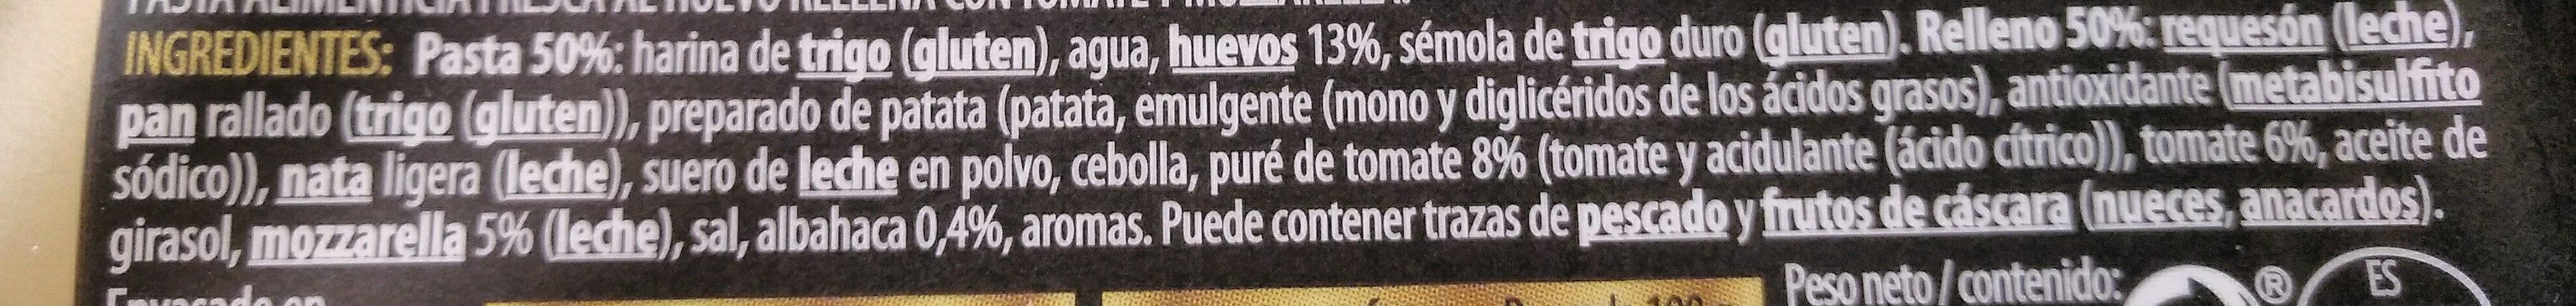 Pasta Fresca Girasoli Tomate y Mozzarella - Ingredients - es